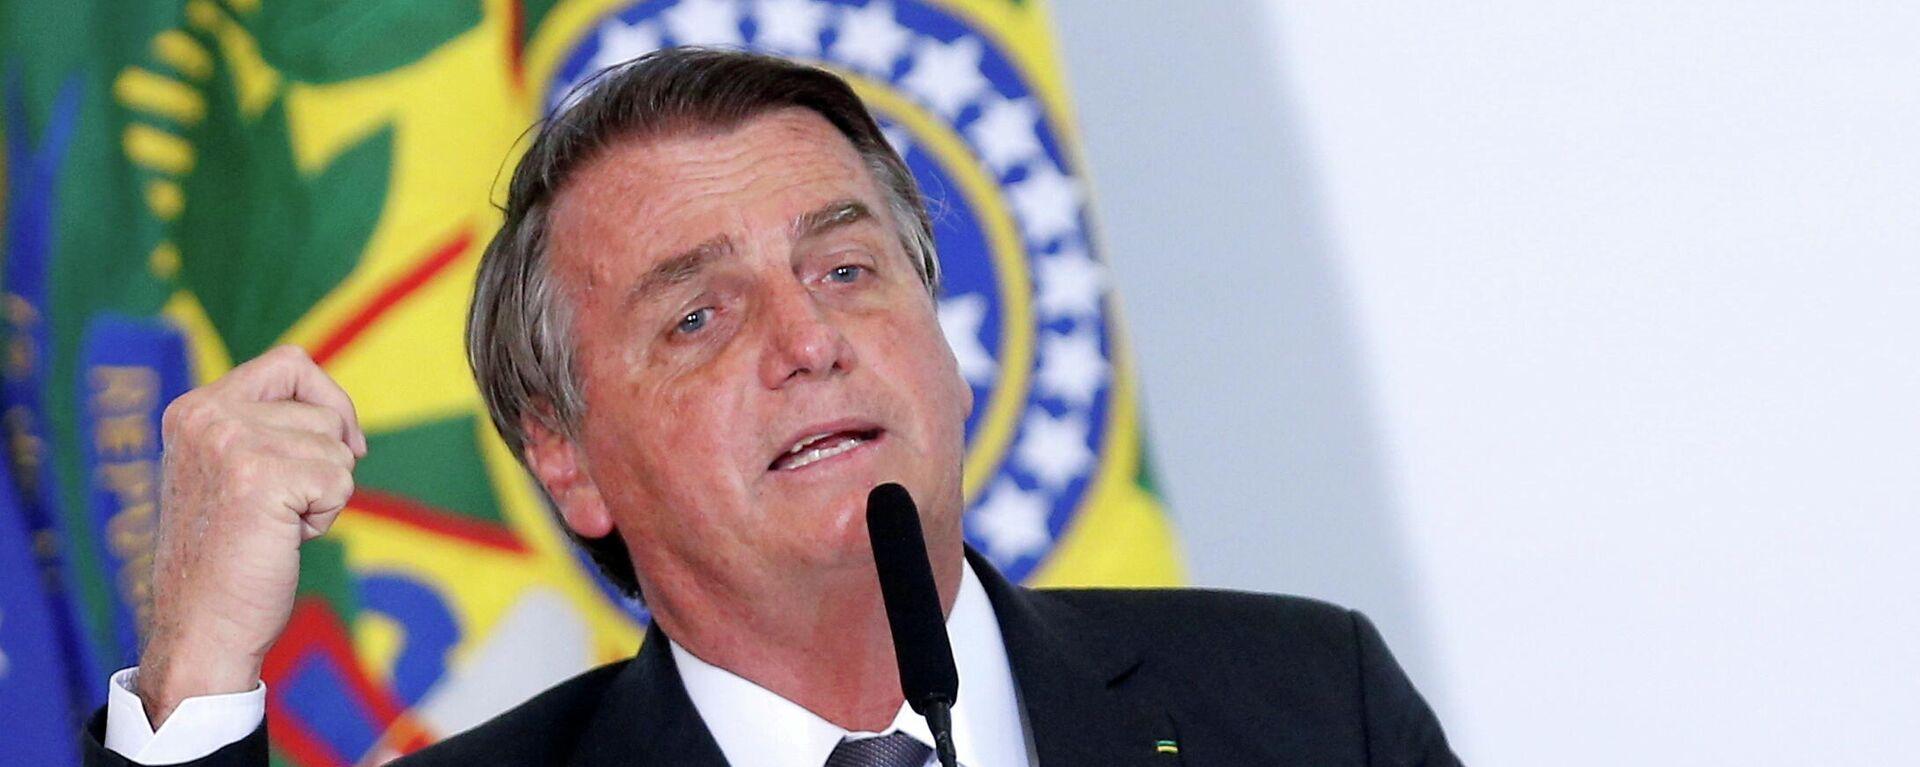 Jair Bolsonaro, presidente de Brasil - Sputnik Mundo, 1920, 20.07.2021